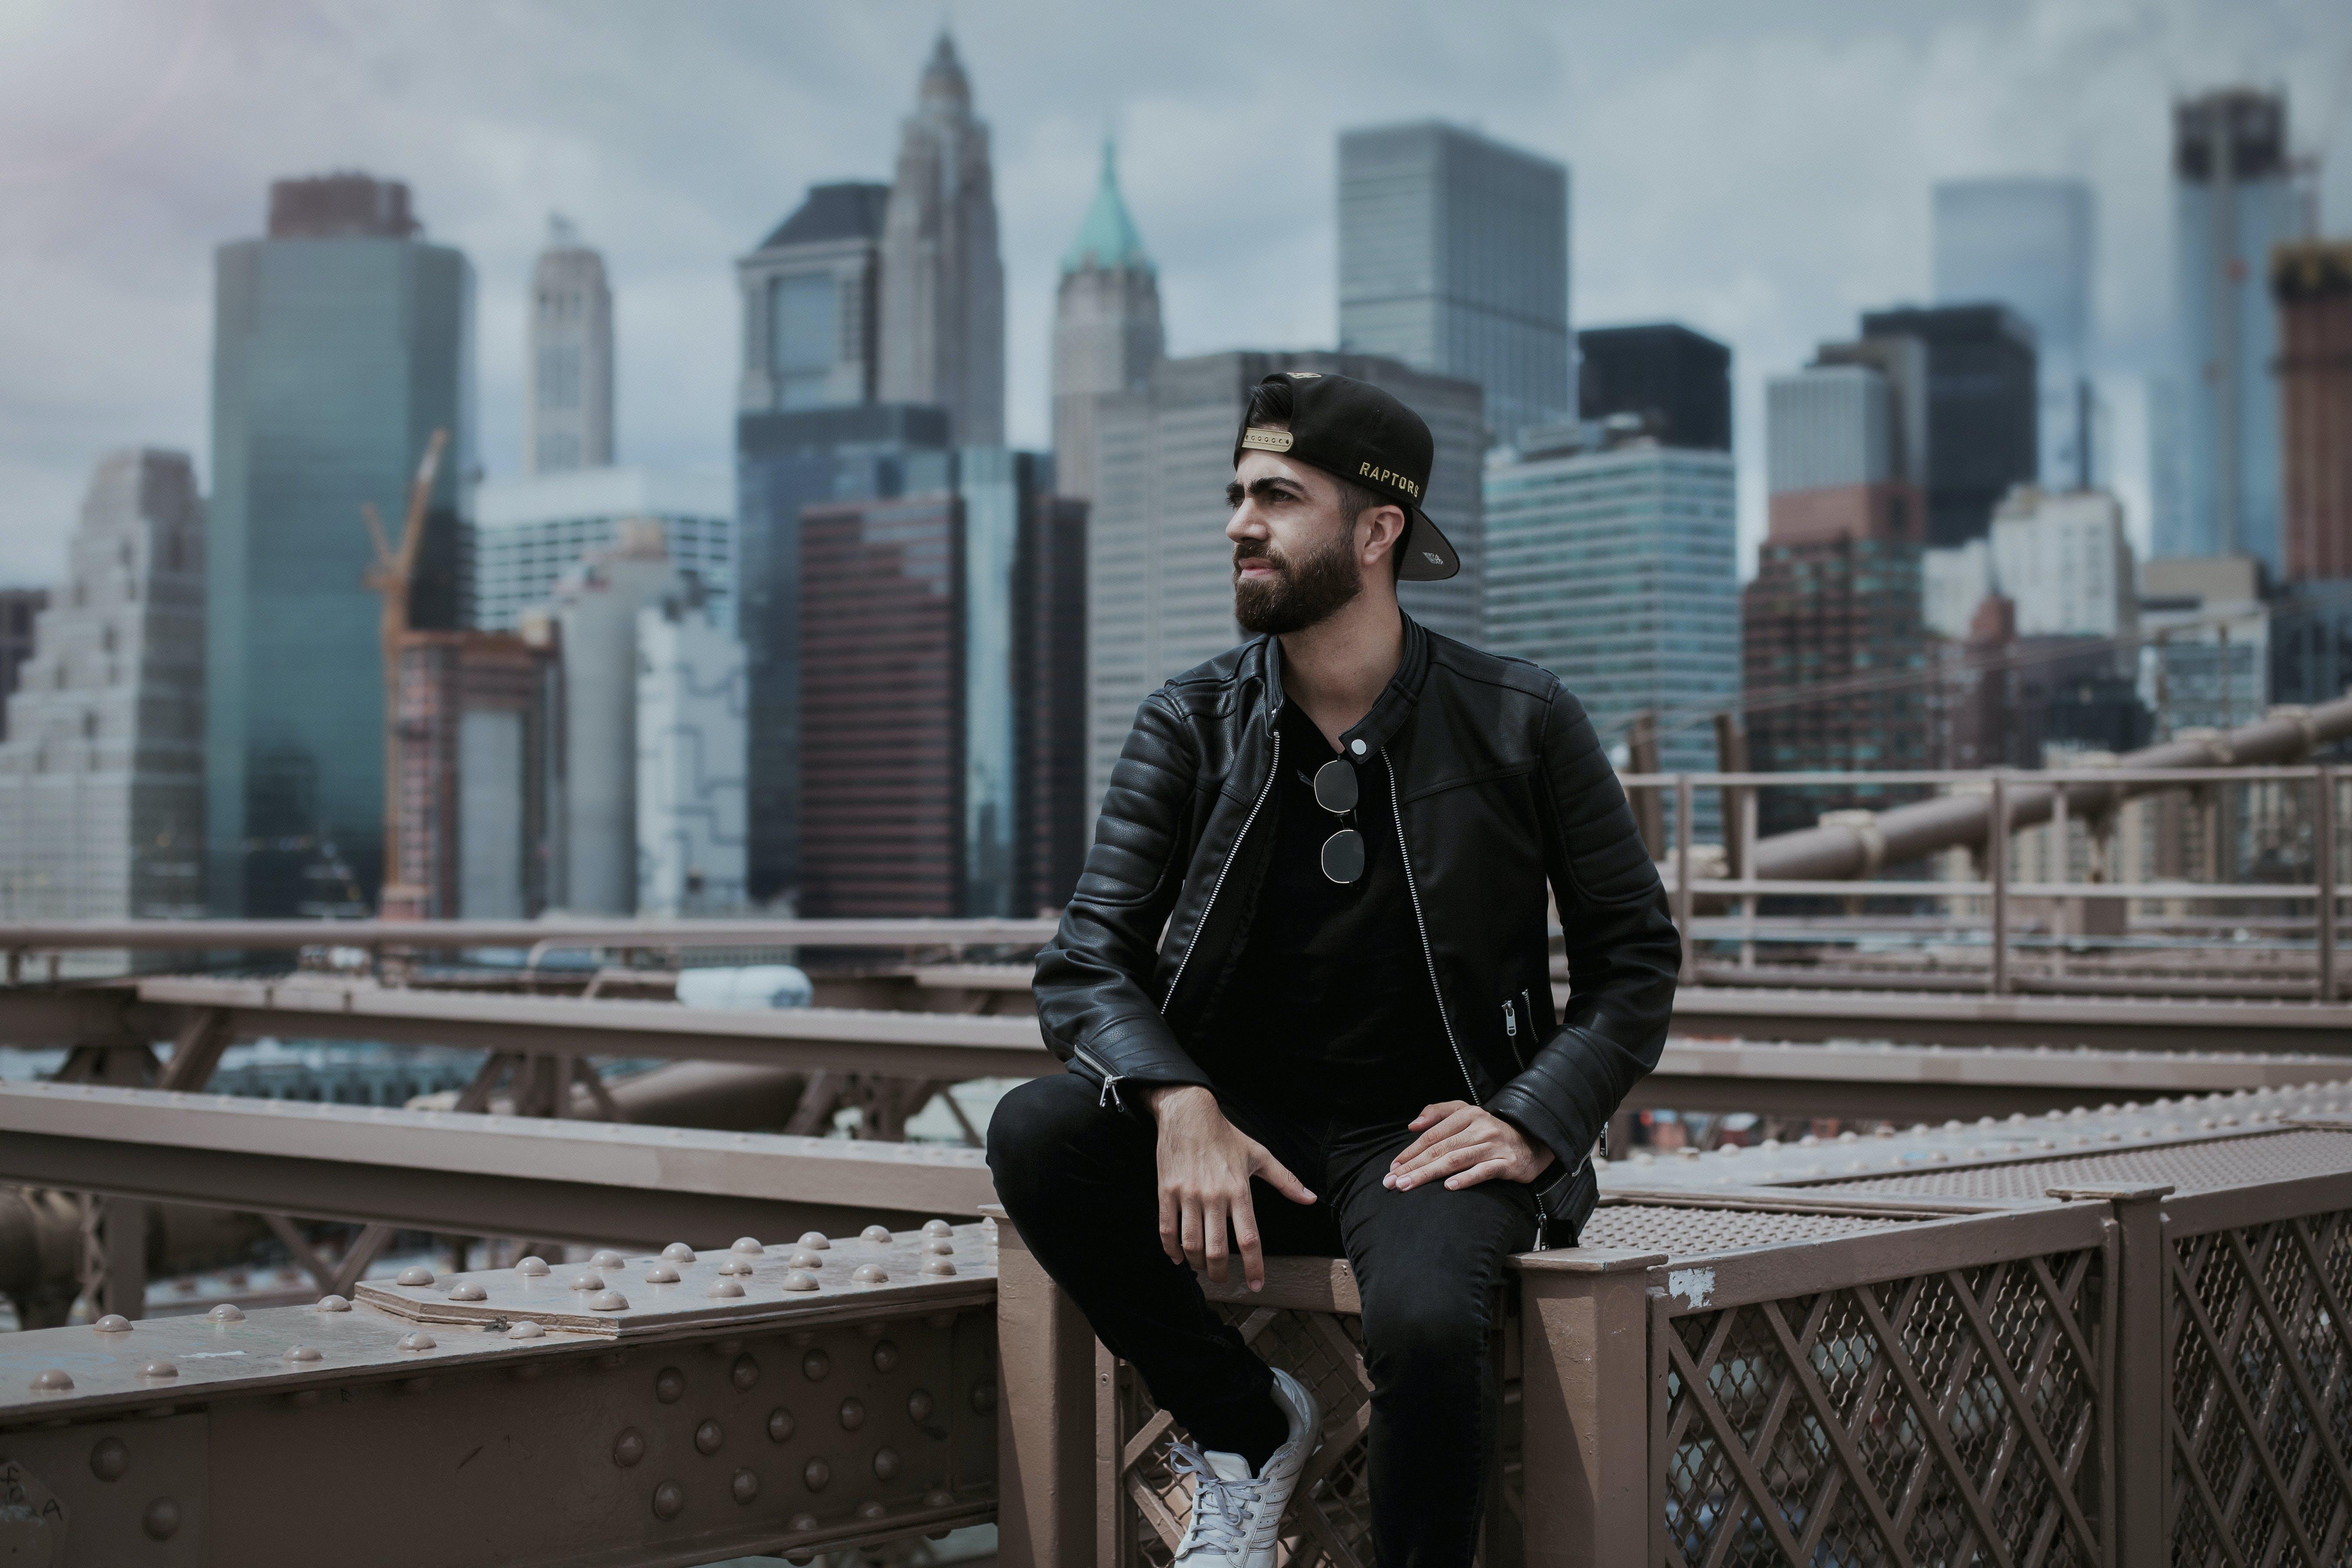 Man Wearing Black Zip-up Leather Jacket